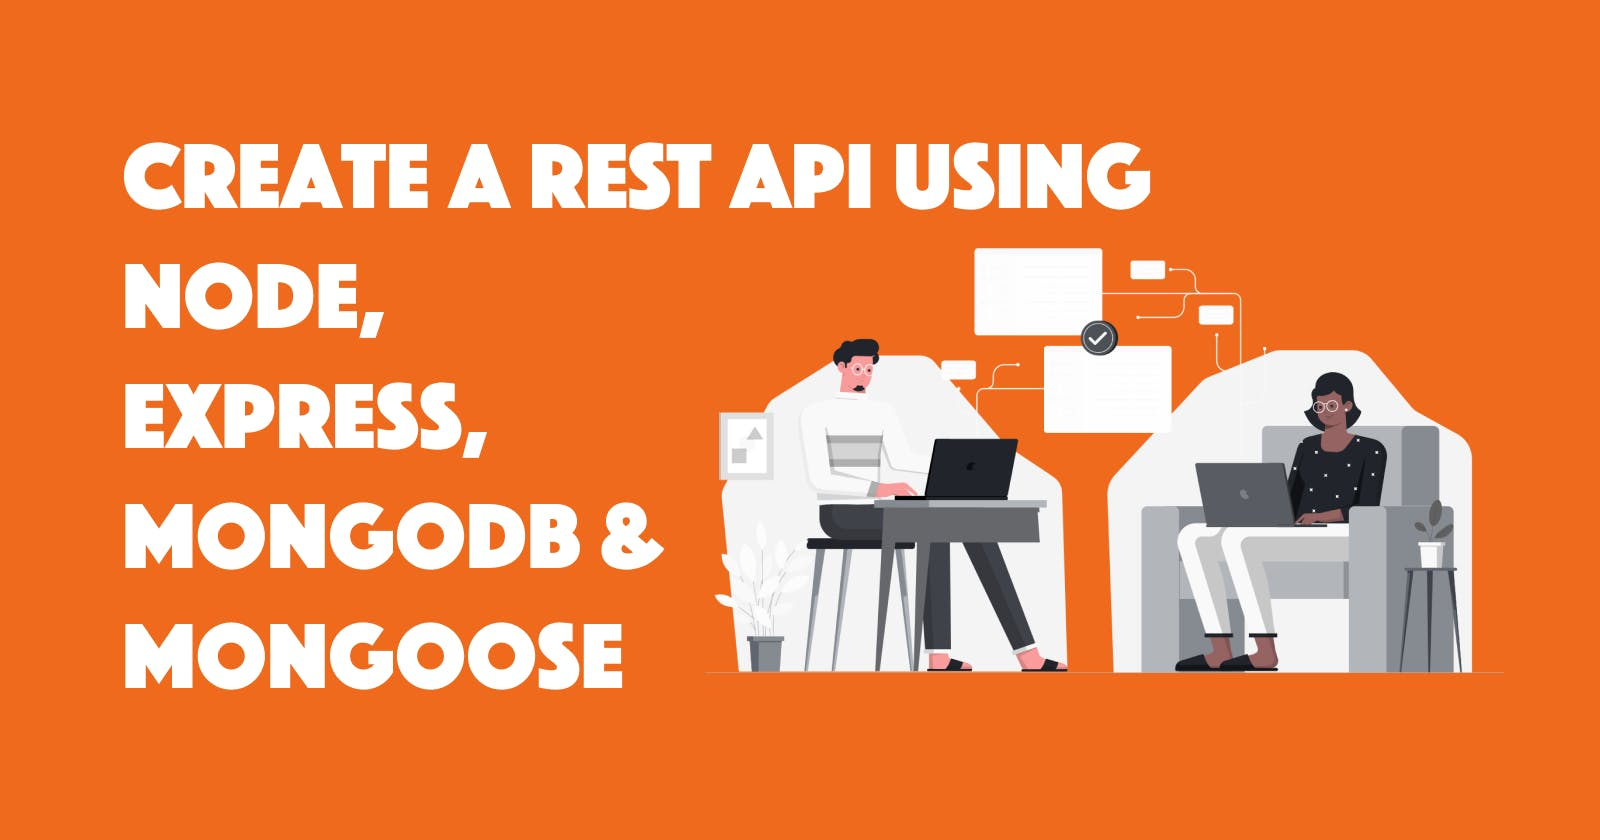 Creating REST API Using NodeJS, ExpressJs, MongoDB, And Mongoose